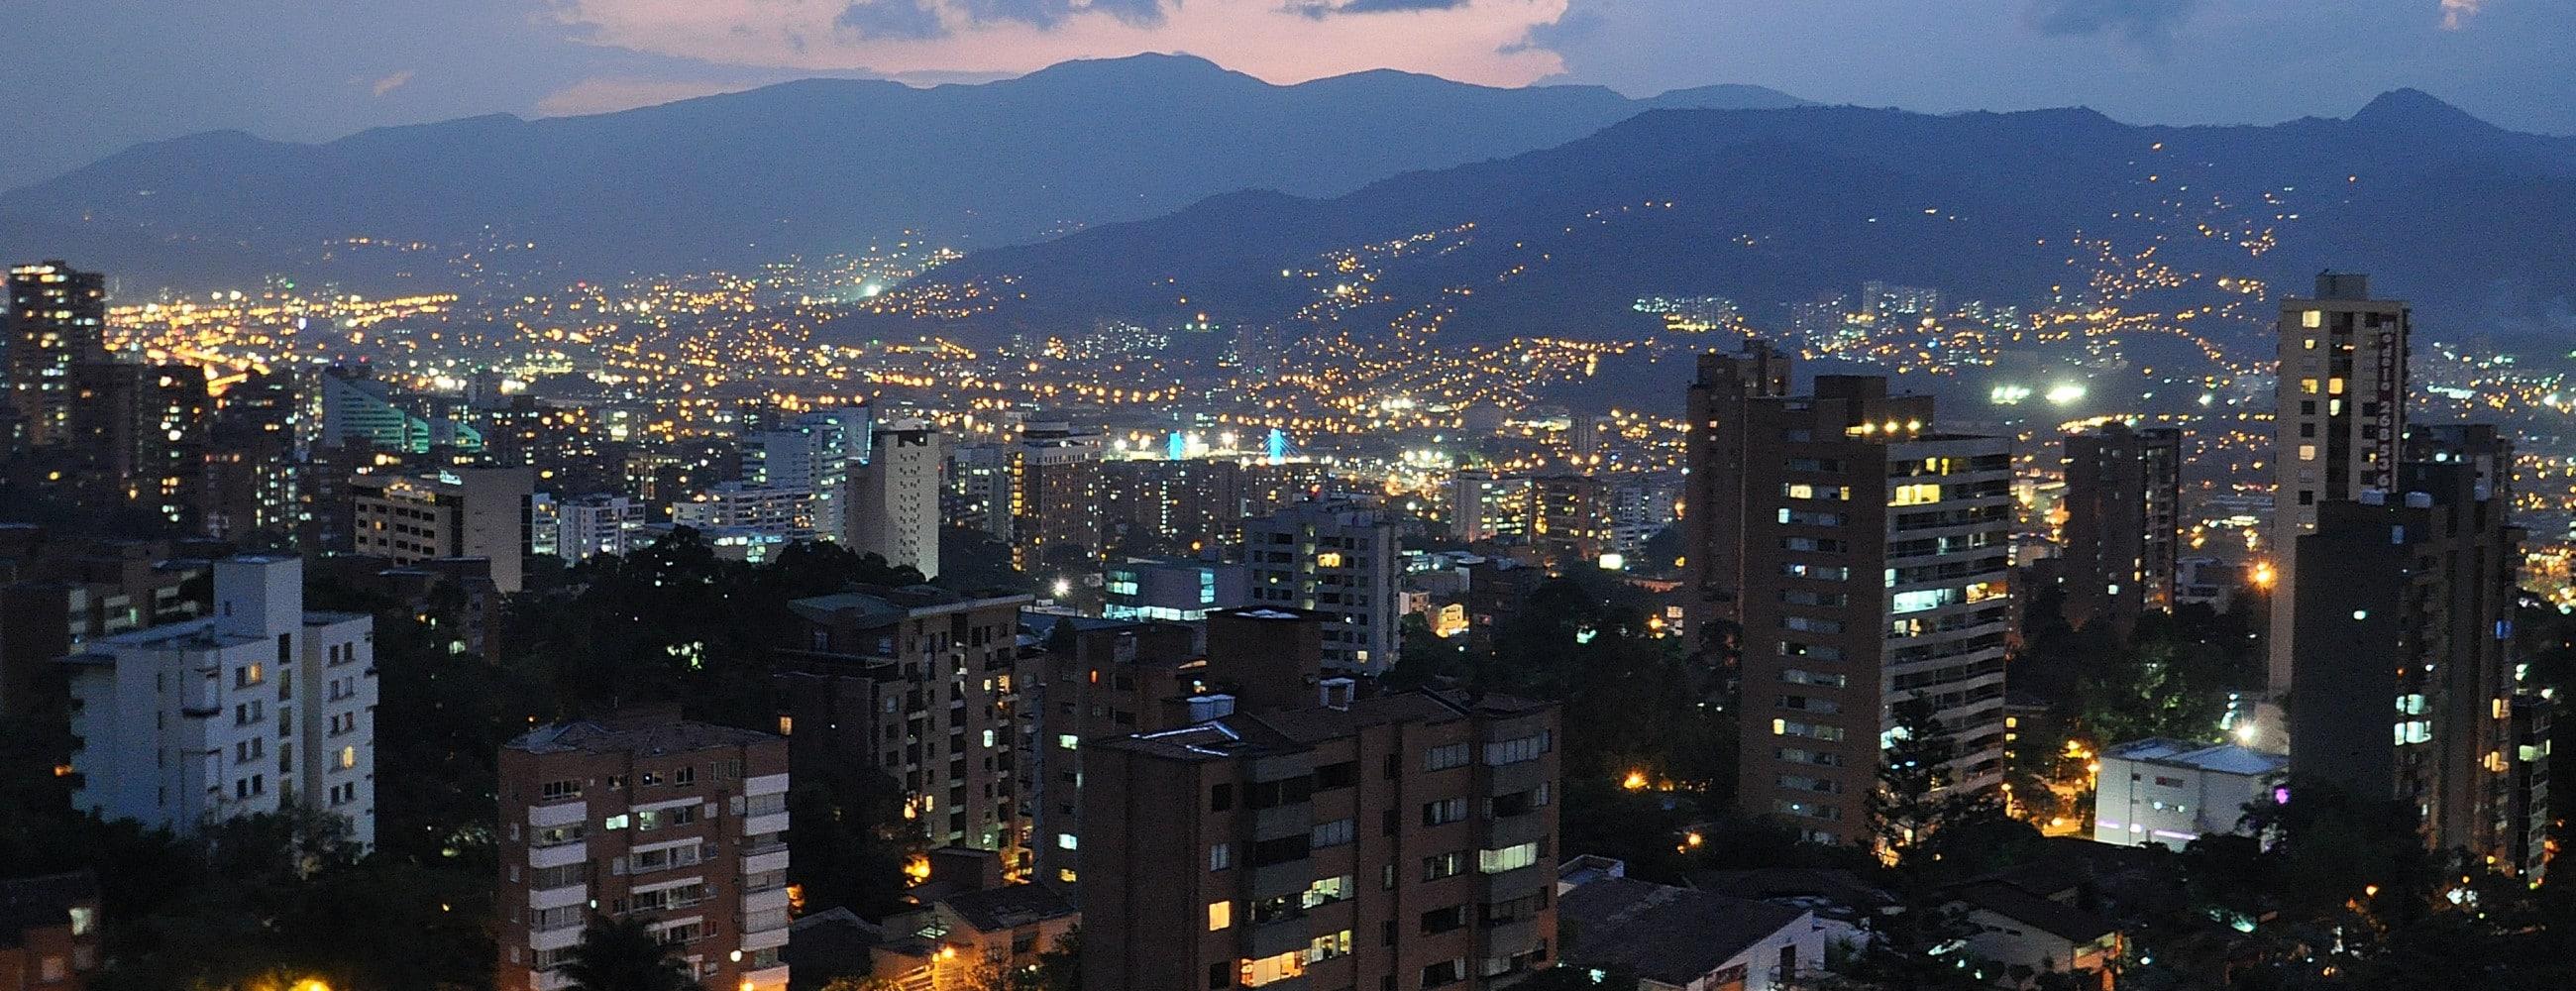 Volunteer with Globalteer in Medellin, Colombia